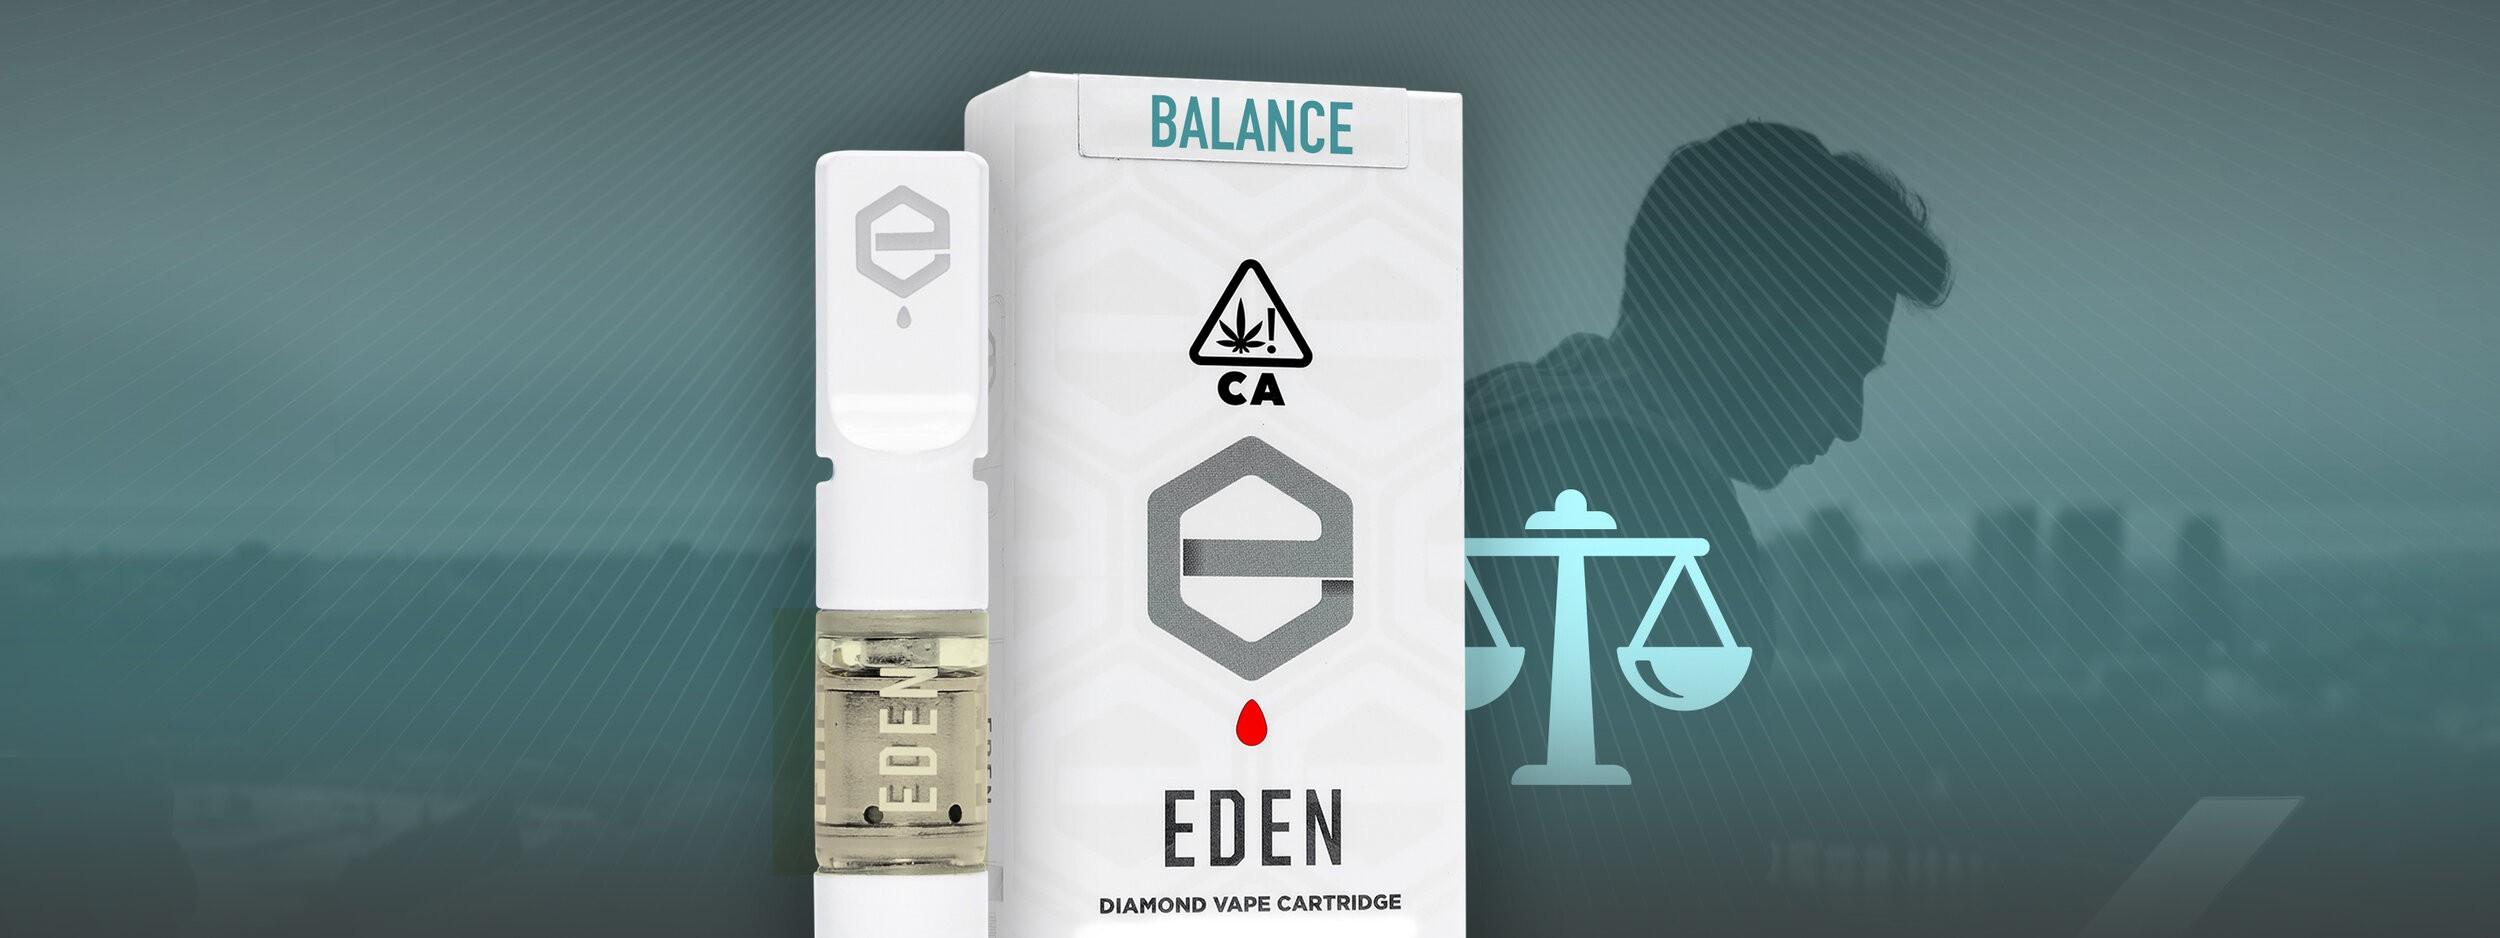 Eden SuperCannabiniod WebMarquee balance